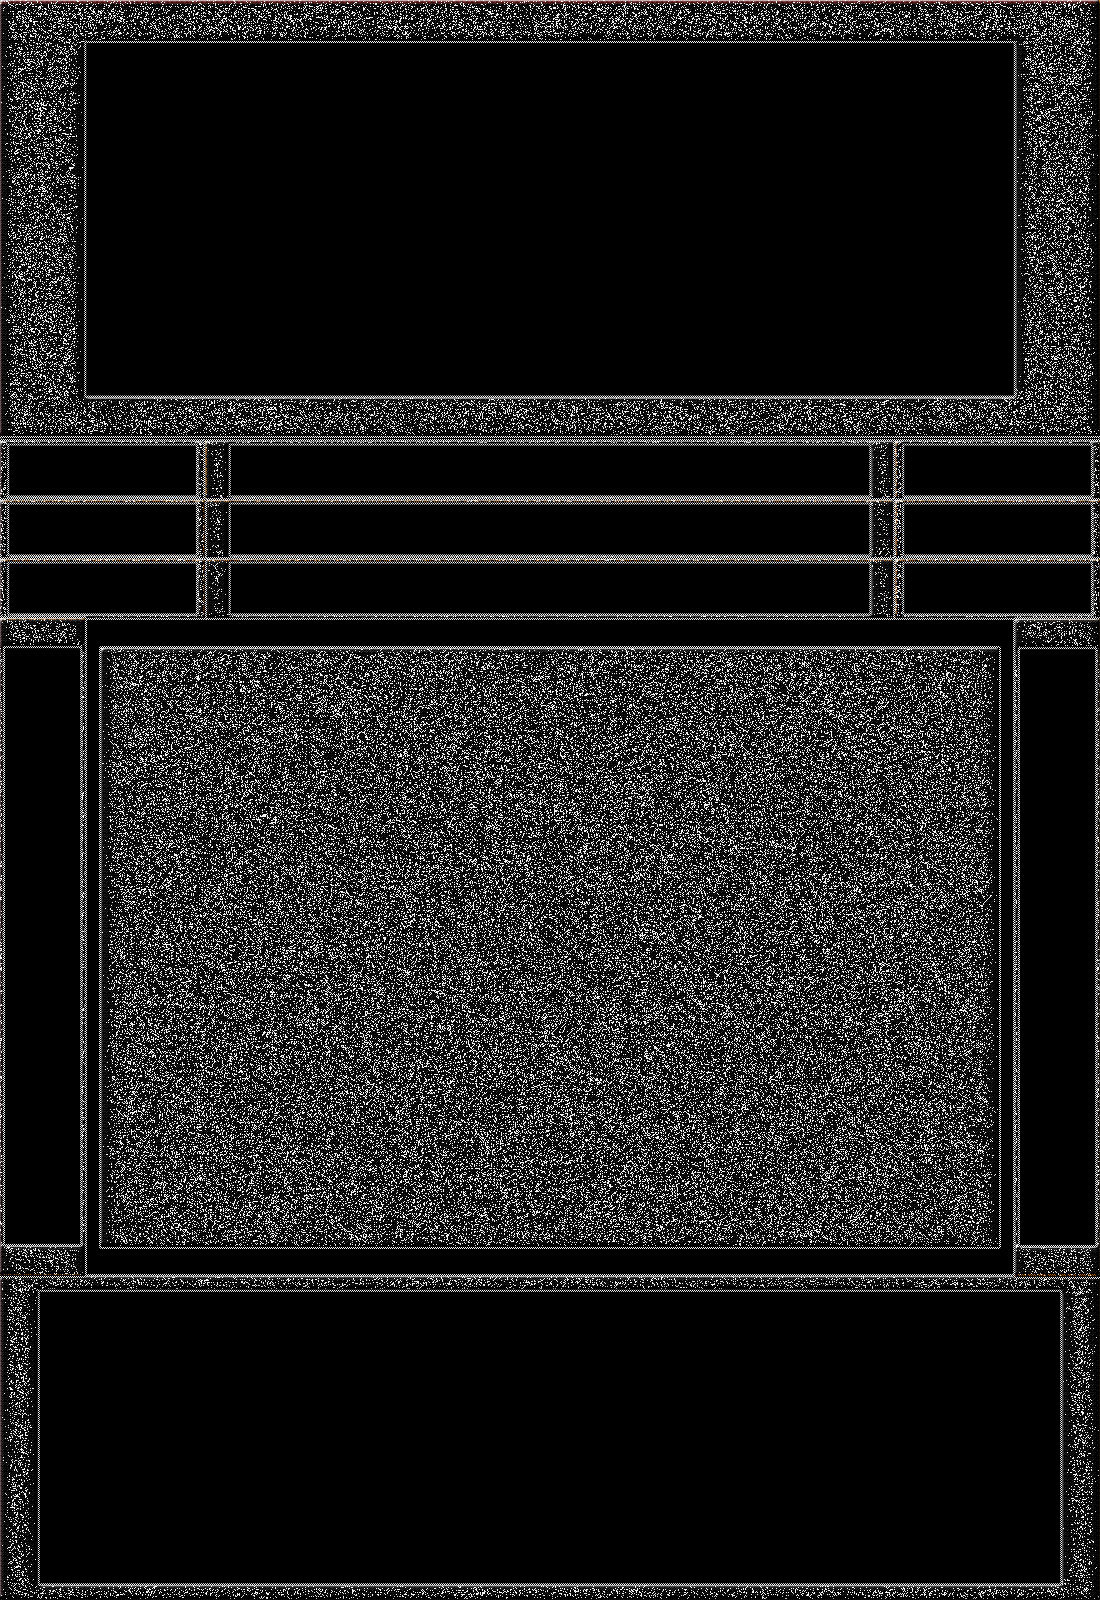 flatcastradyondexlerifjjrs.jpg